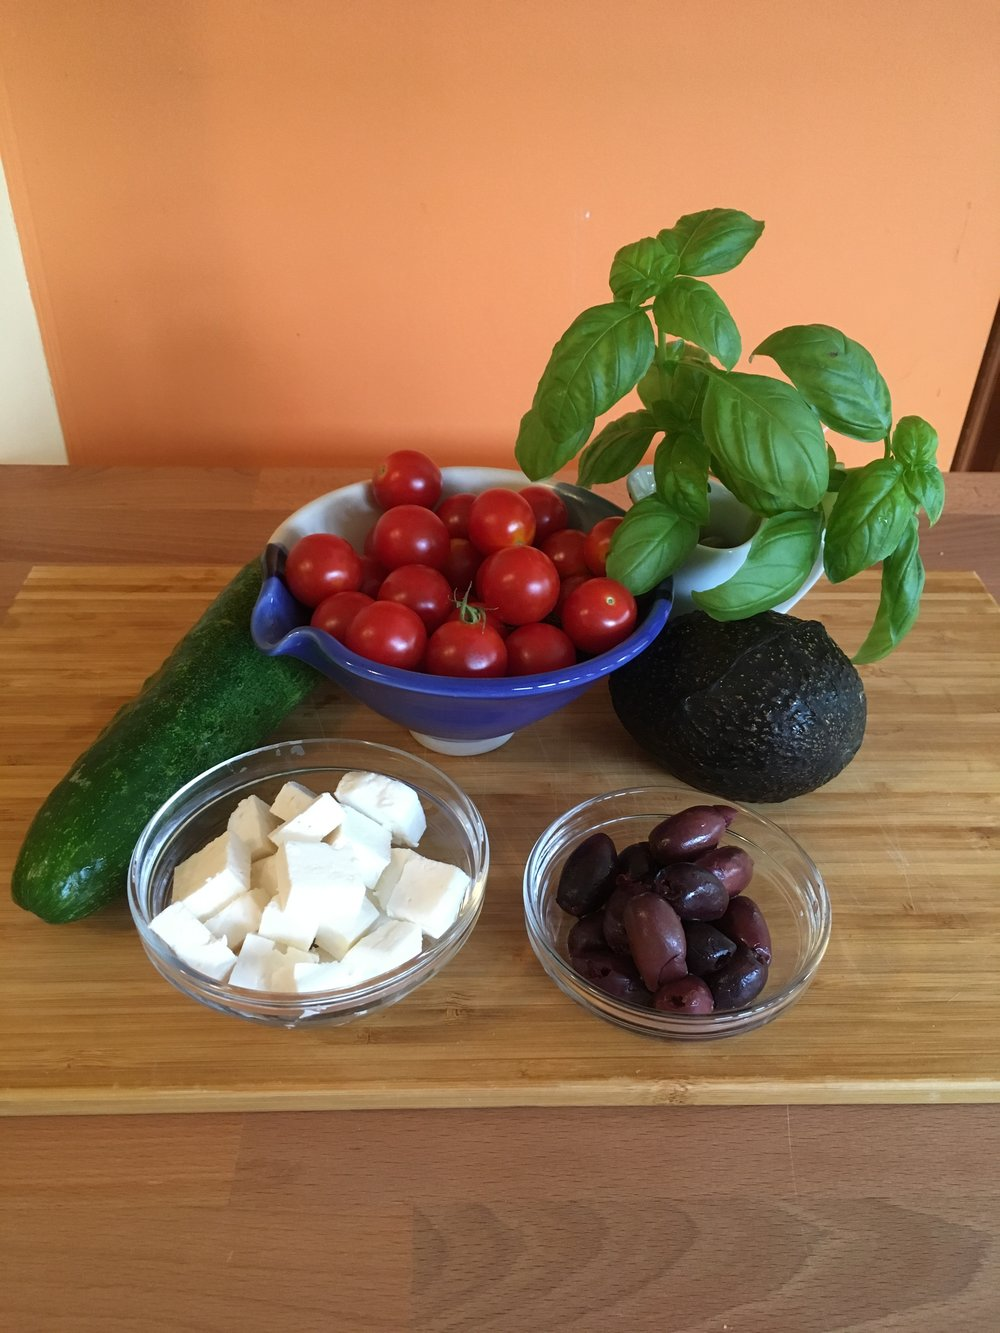 tomato-basil-salad-recipe.jpg